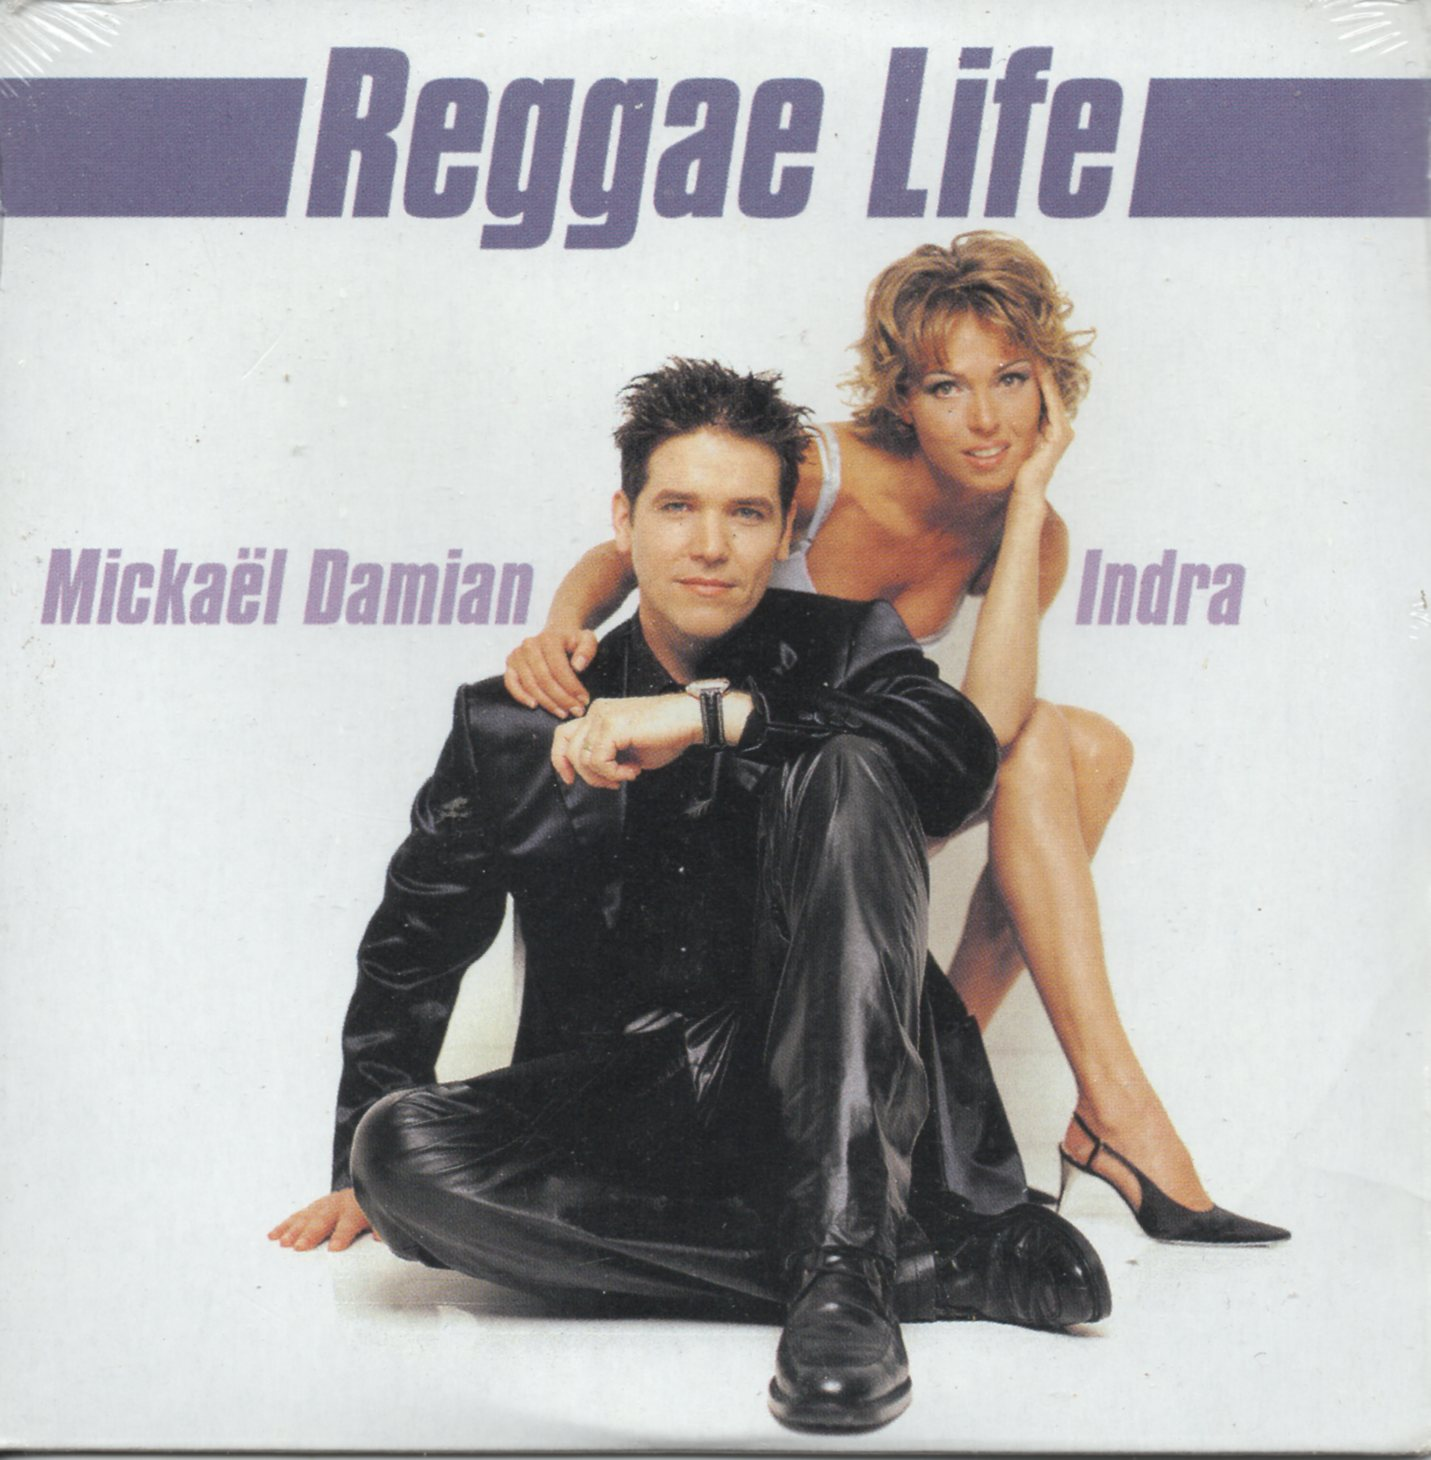 INDRA & MICKAËL DAMIAN - Reggae life 2-track CARD SLEEVE - CD single